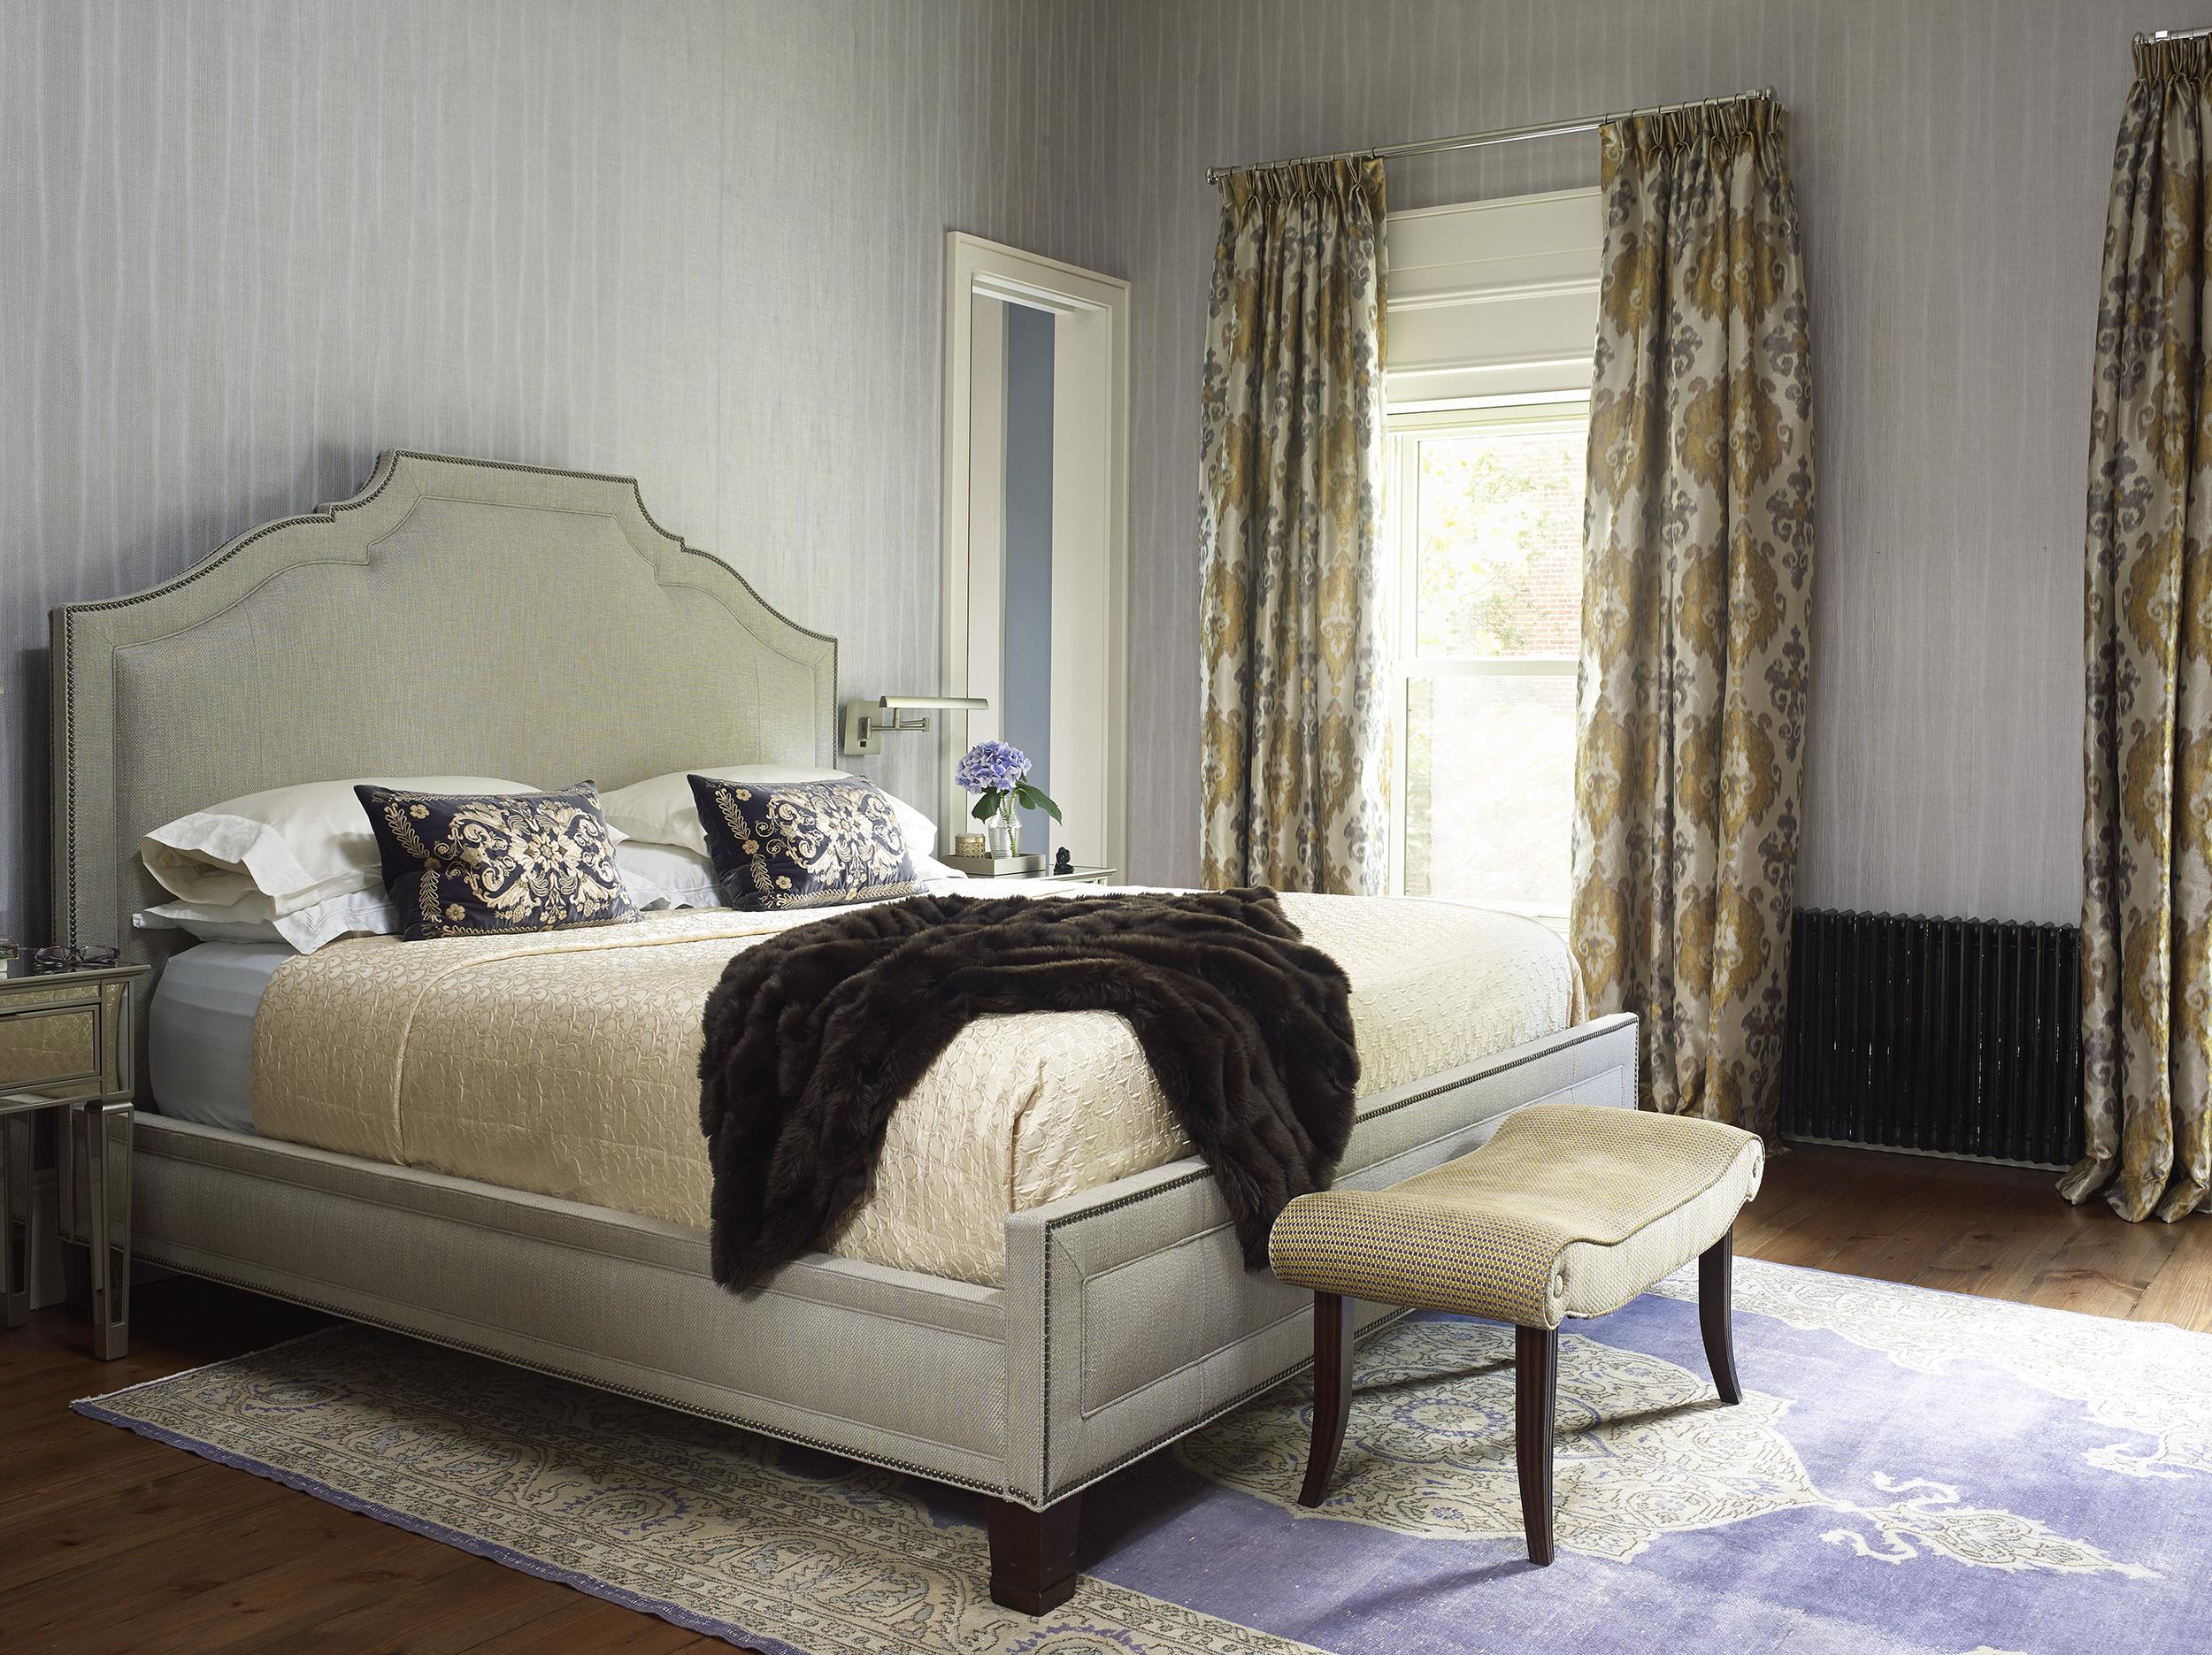 Bedroom-045.jpg